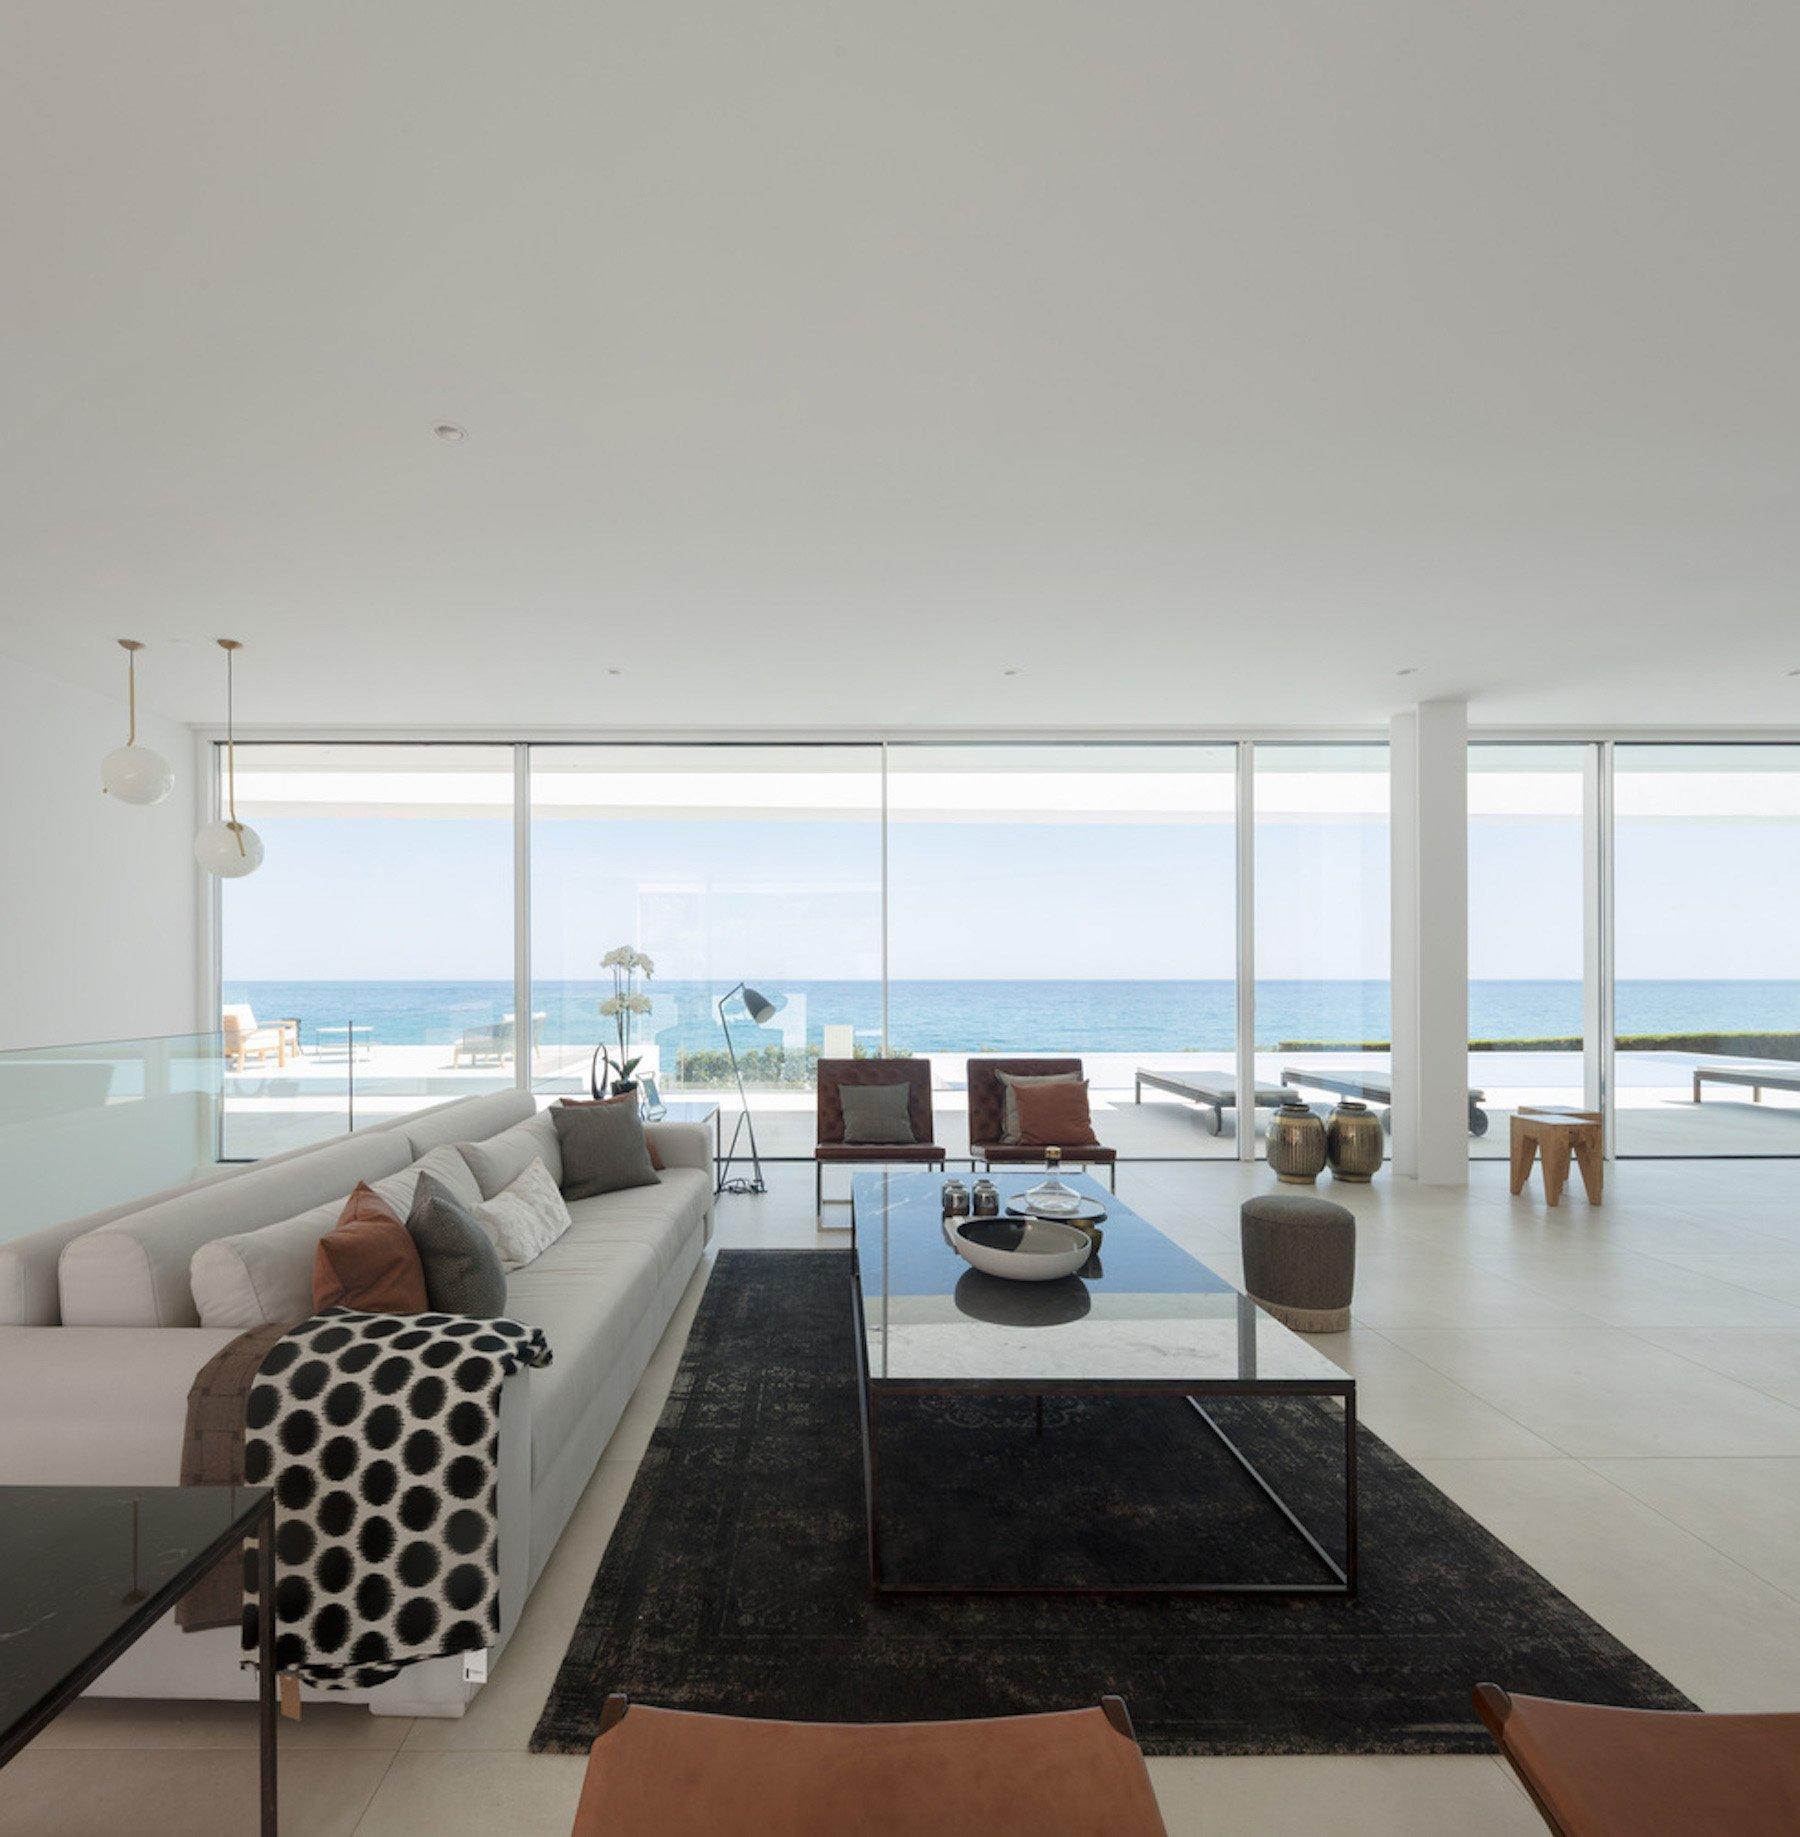 iGNANT-Architecture-Mário-Martins-Atelier-Casa-Carrara-19